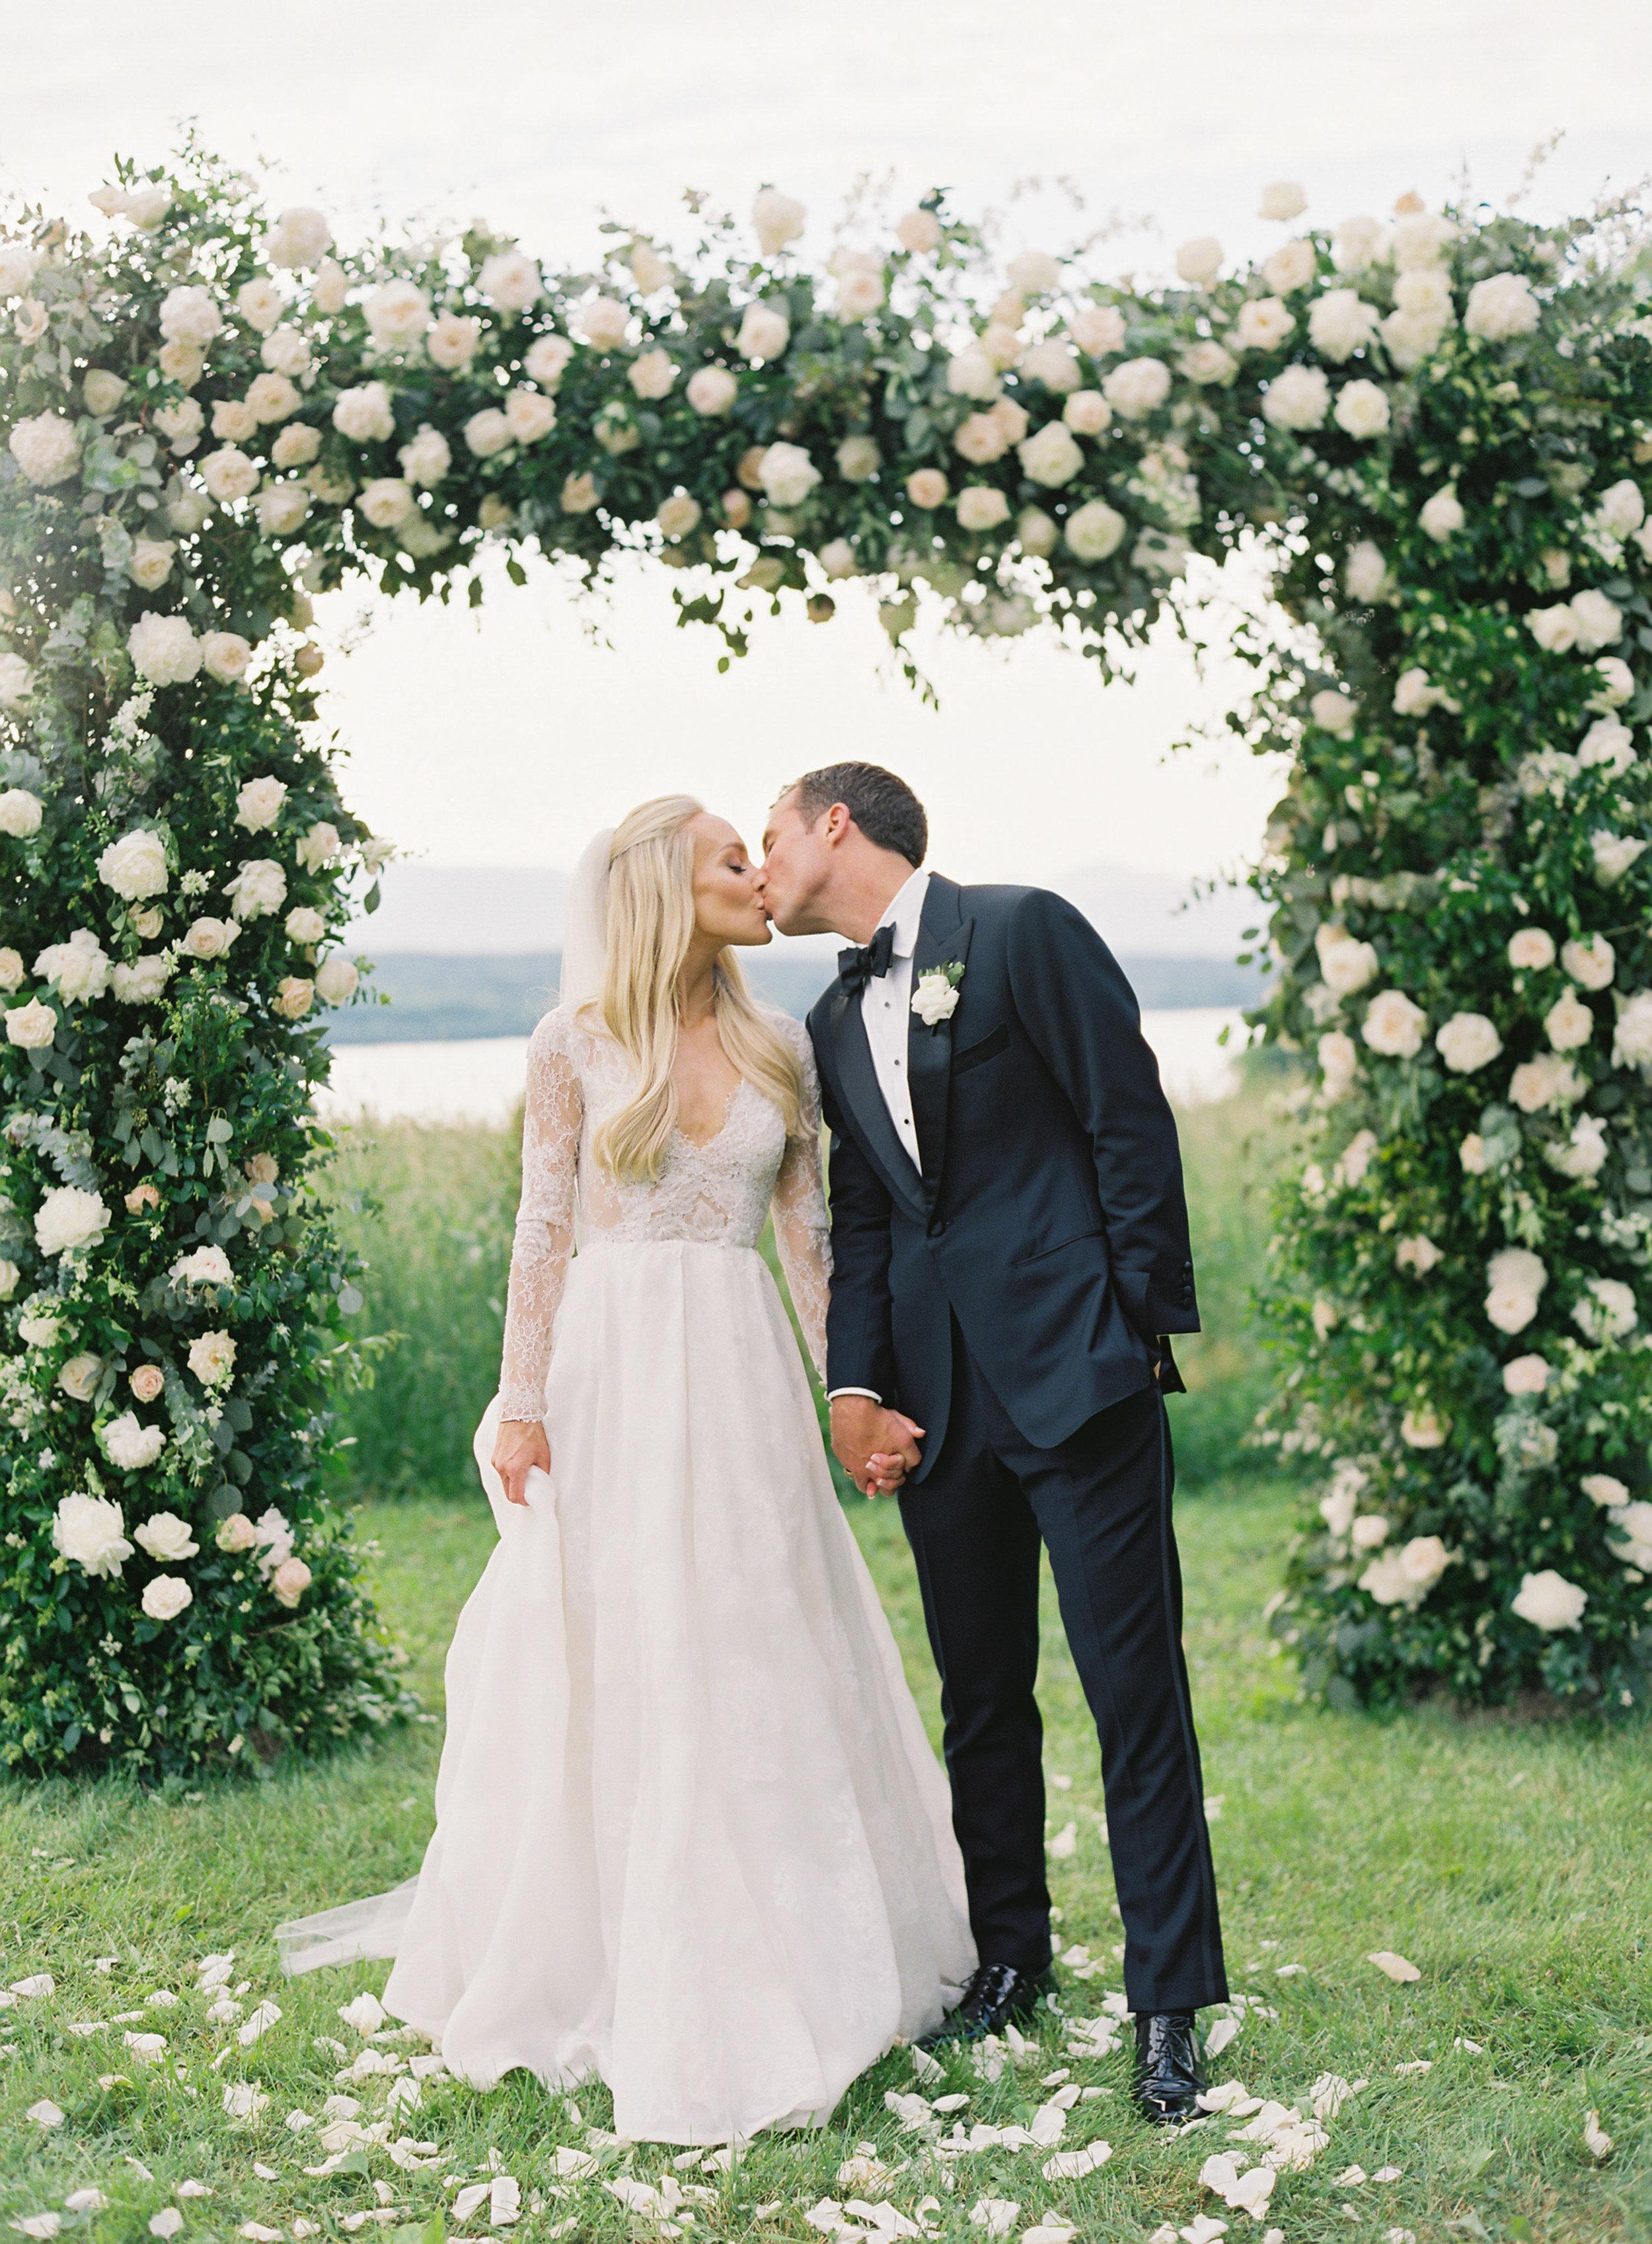 Ankony_Farm_Wedding-184-Jen-Huang-AS-419-Jen-Huang-003149-R1-008.jpg